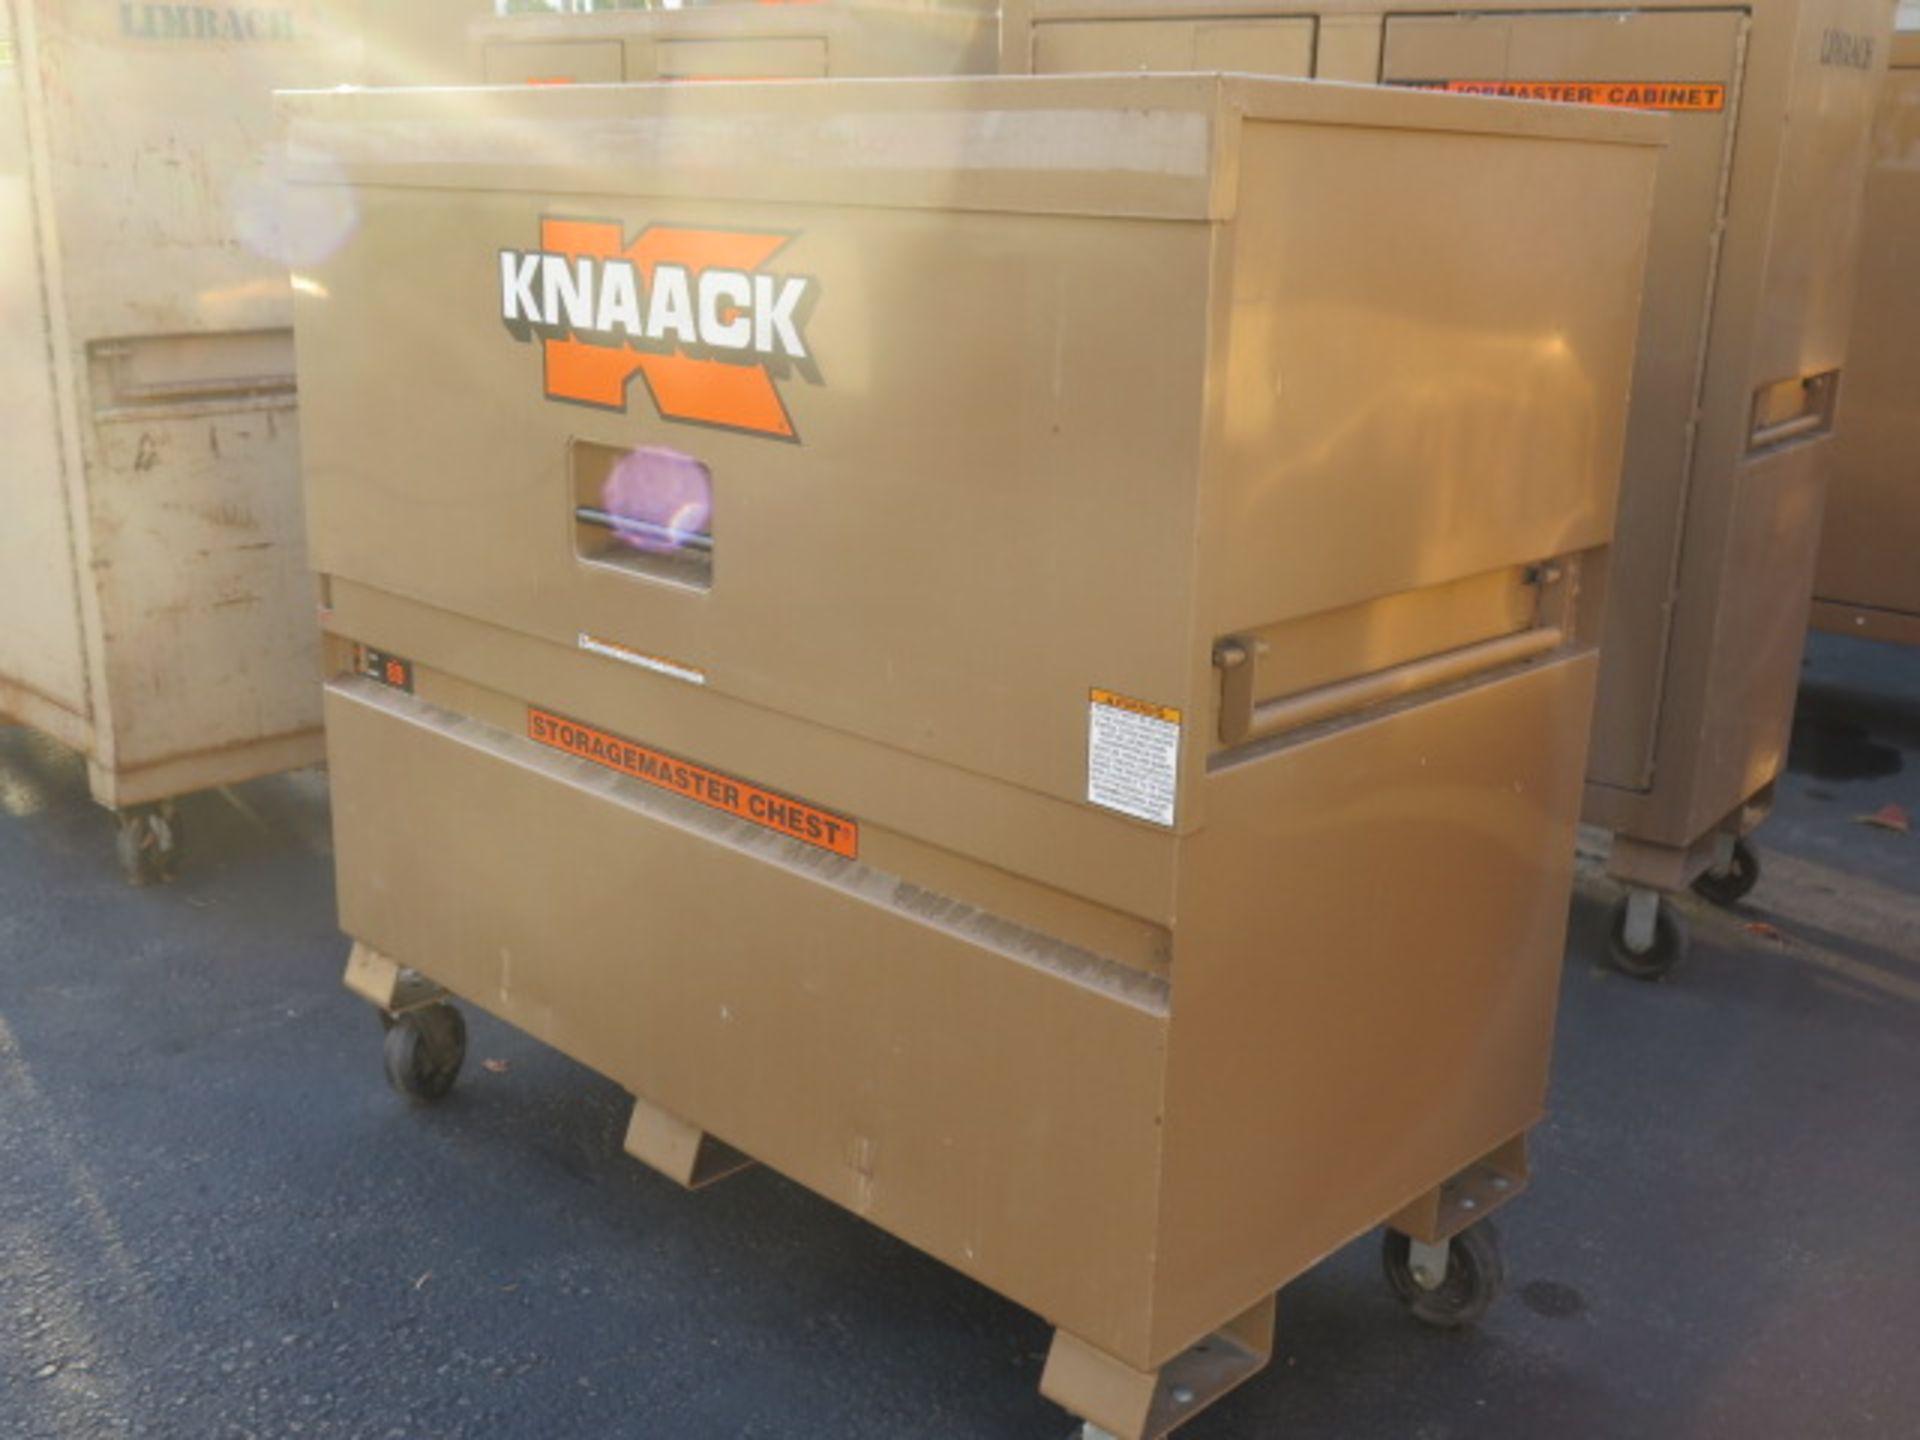 Knaack mdl. 89 Storagemaster Rolling Job Box (SOLD AS-IS - NO WARRANTY) - Image 3 of 11